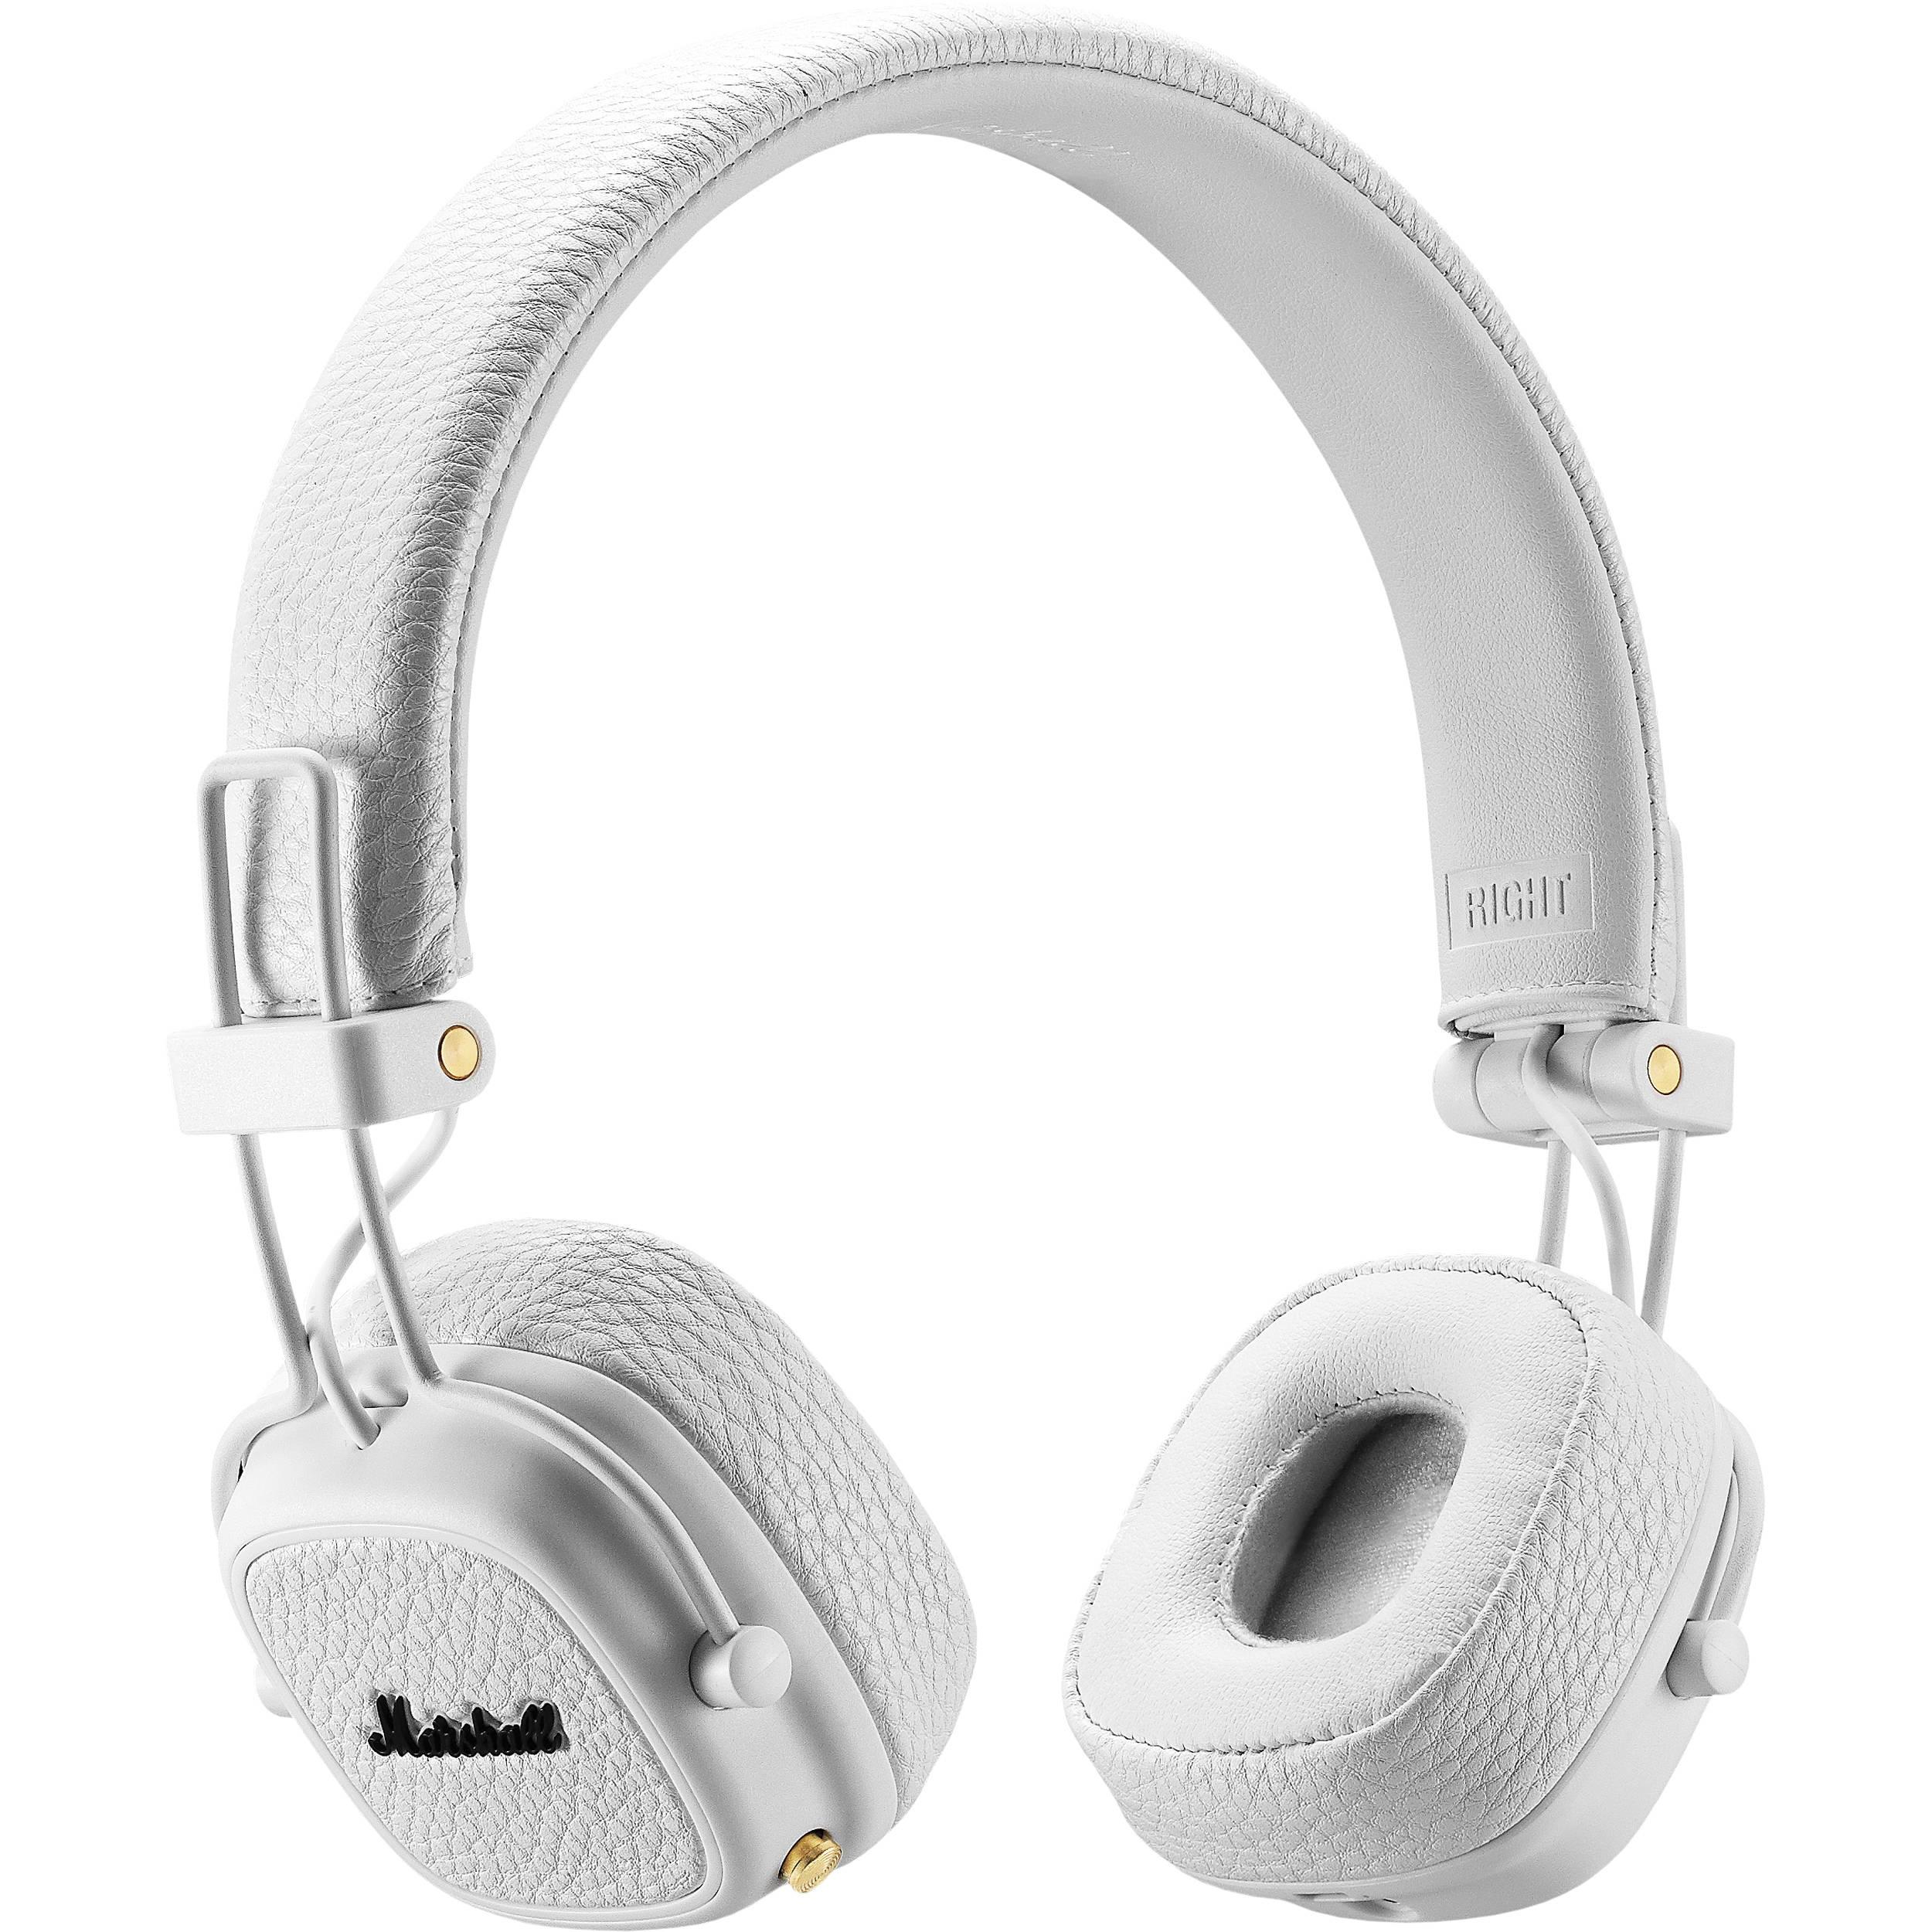 Marshall Major Iii Wireless On Ear Headphones White Mamajor3wh